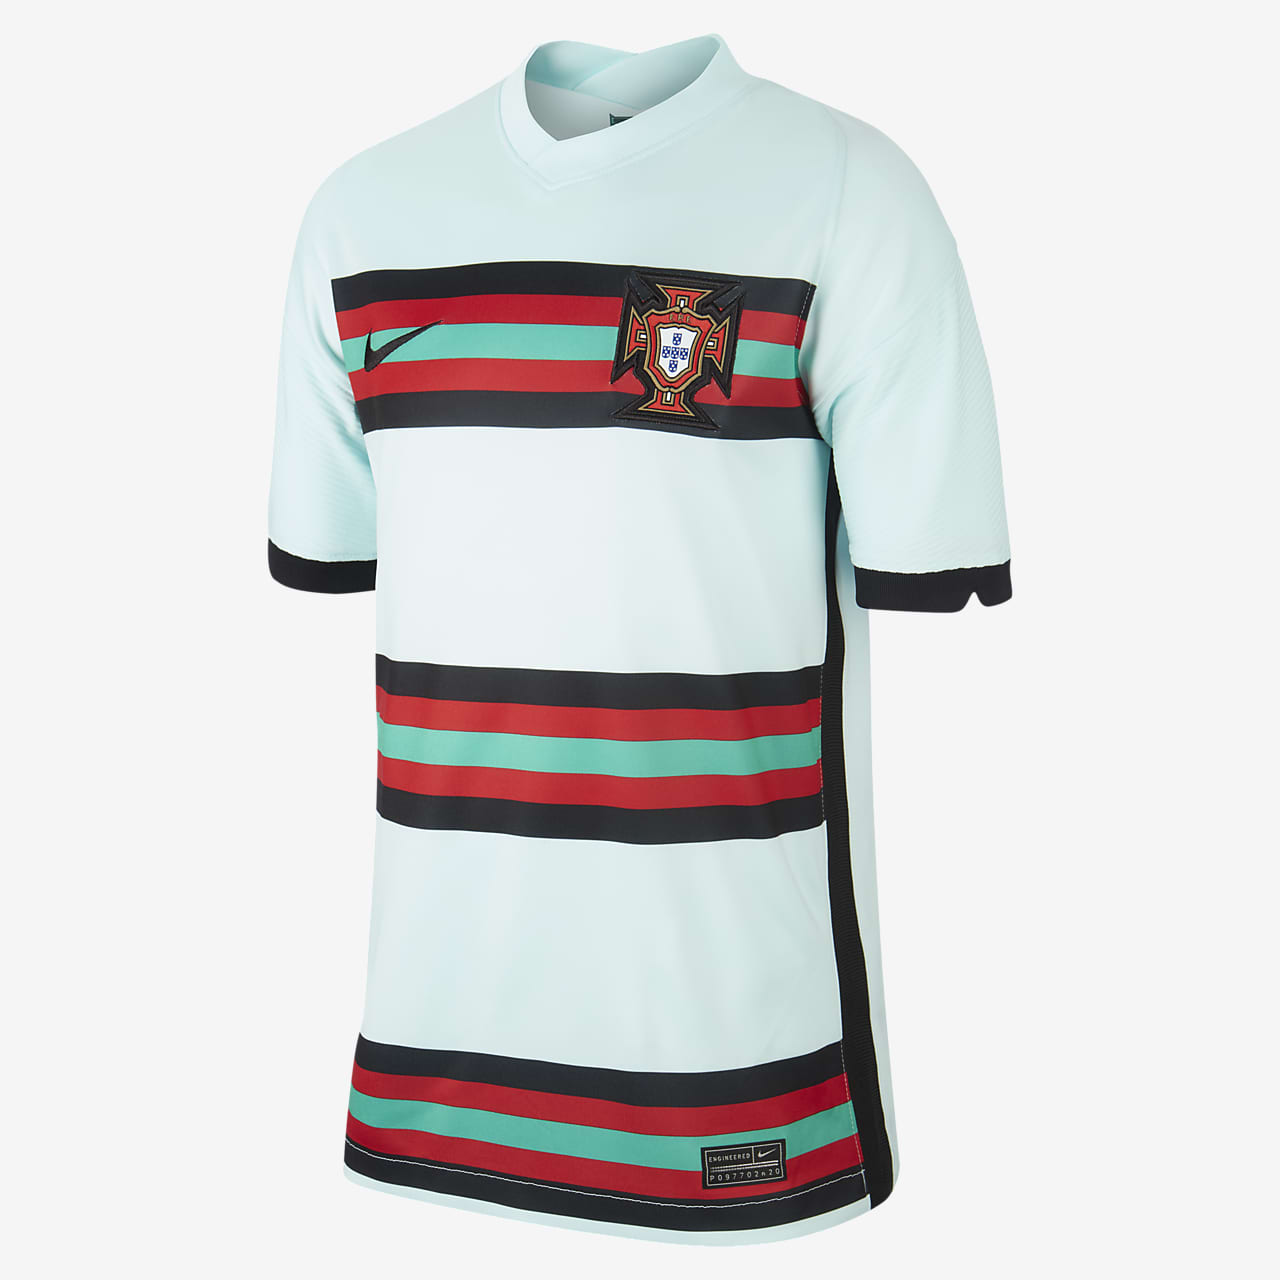 Camiseta de fútbol para niños talla grande Portugal 2020 Stadium Away